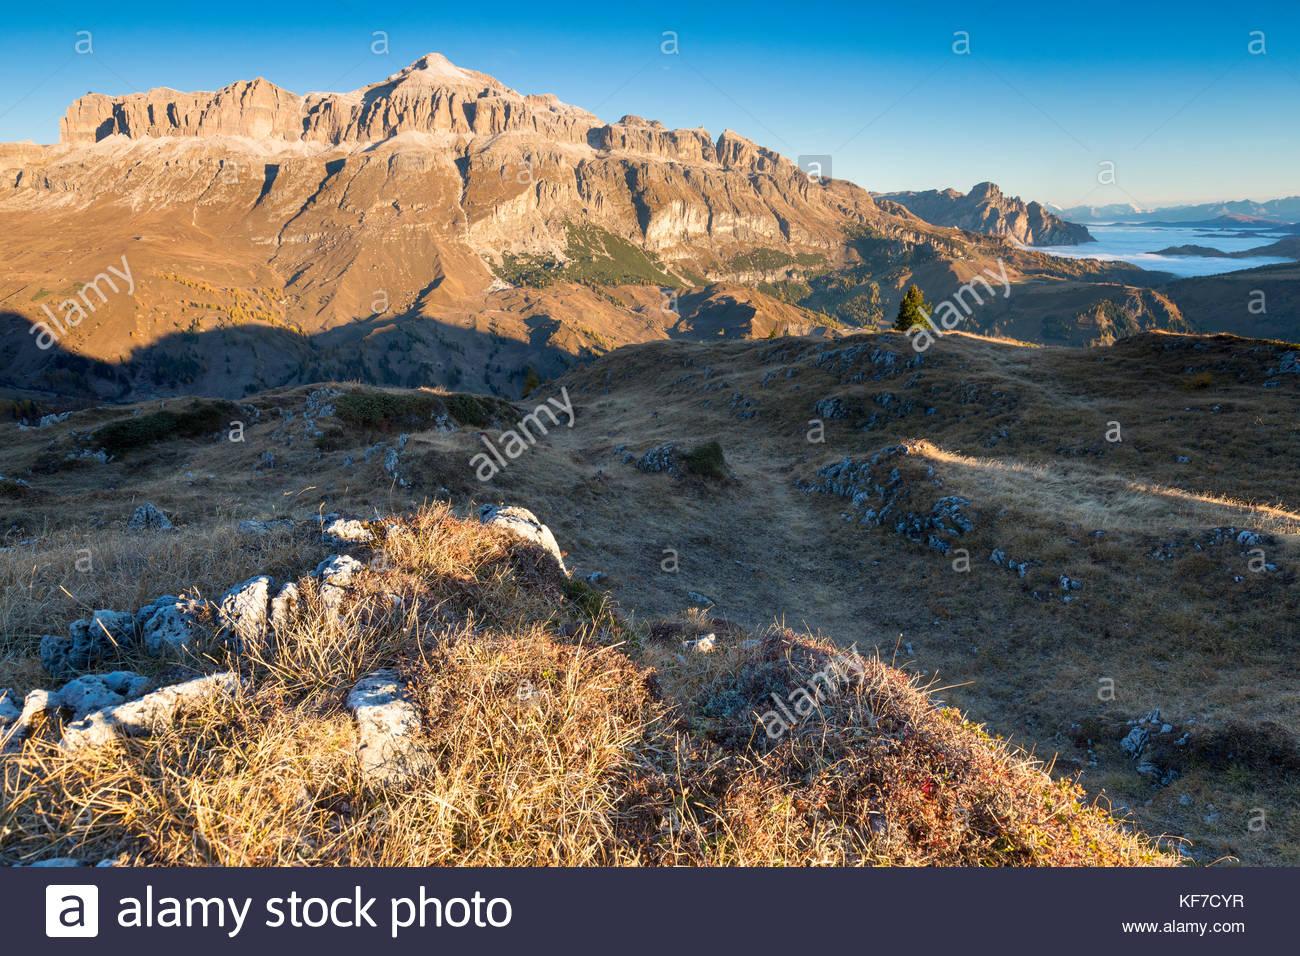 Sella group with the highest Piz Boè mountain in an autumn sunrise, Pordoi pass, Arabba, Beuuno, Veneto, Italy - Stock Image